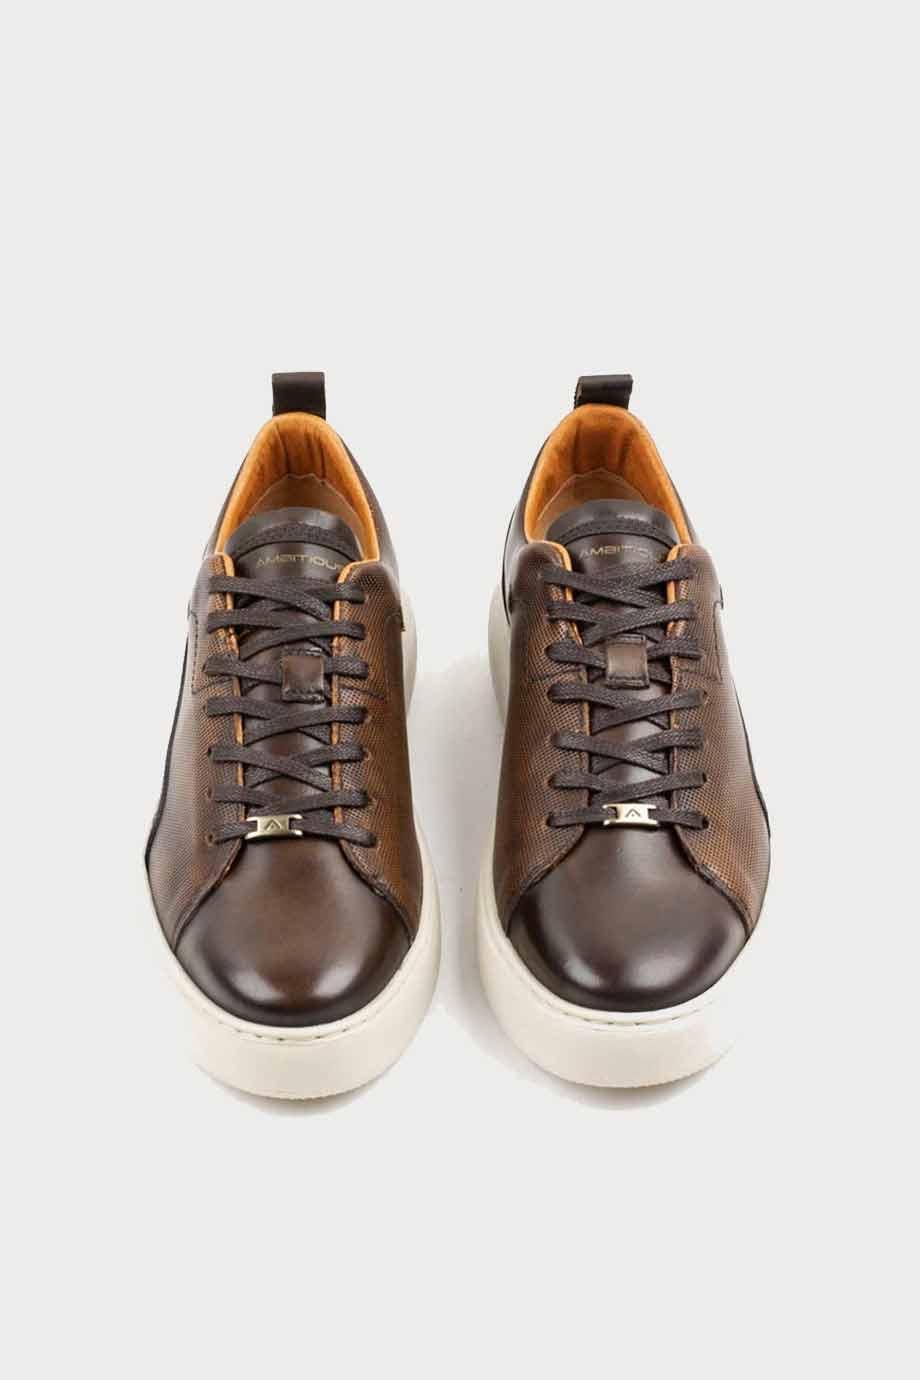 spiridoula metheniti shoes xalkida p 080 158 buzzlight 11890 1861am ambitious 2 1